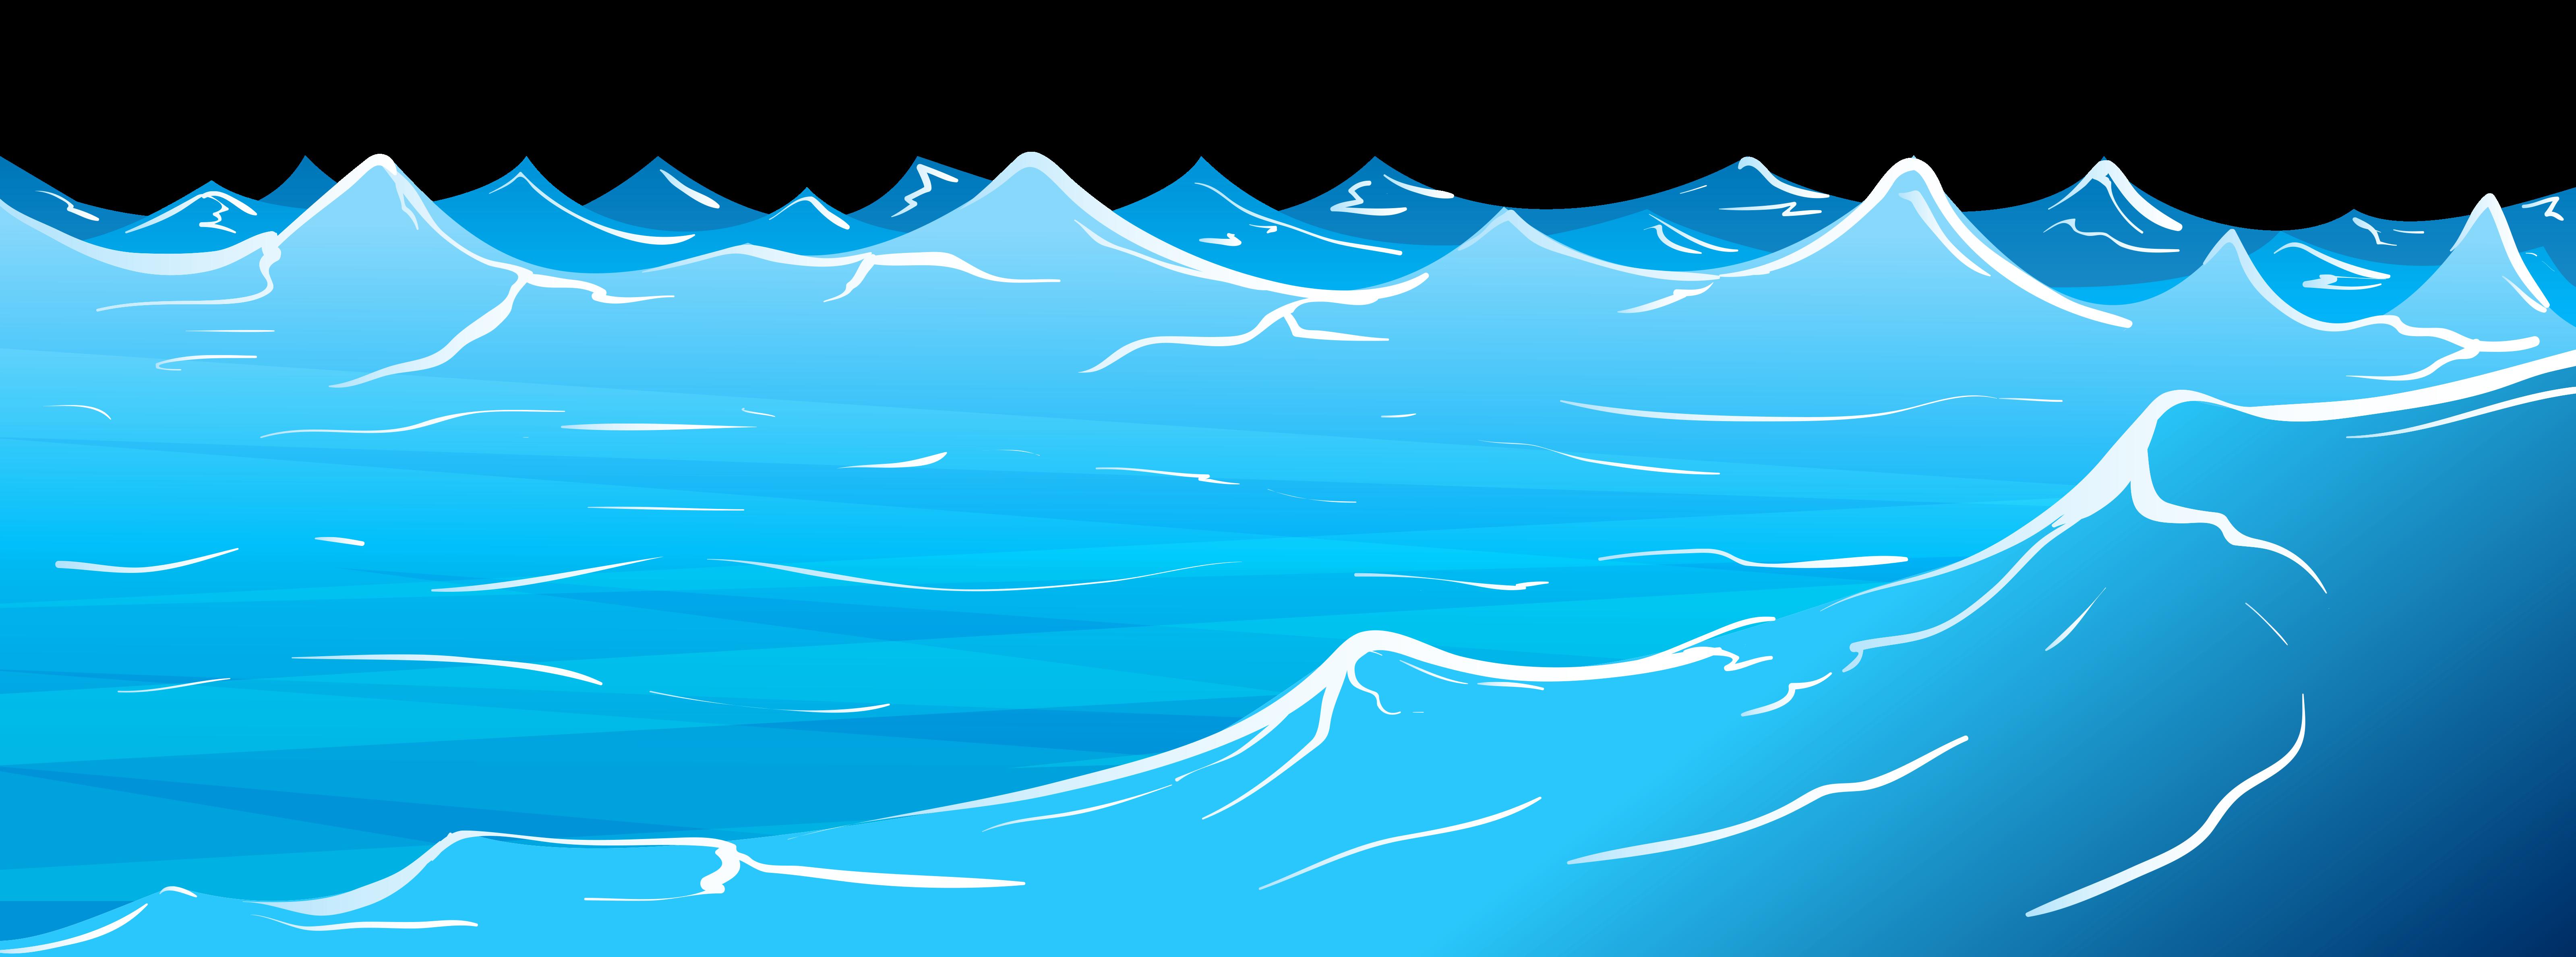 Ocean clipart transparent background.